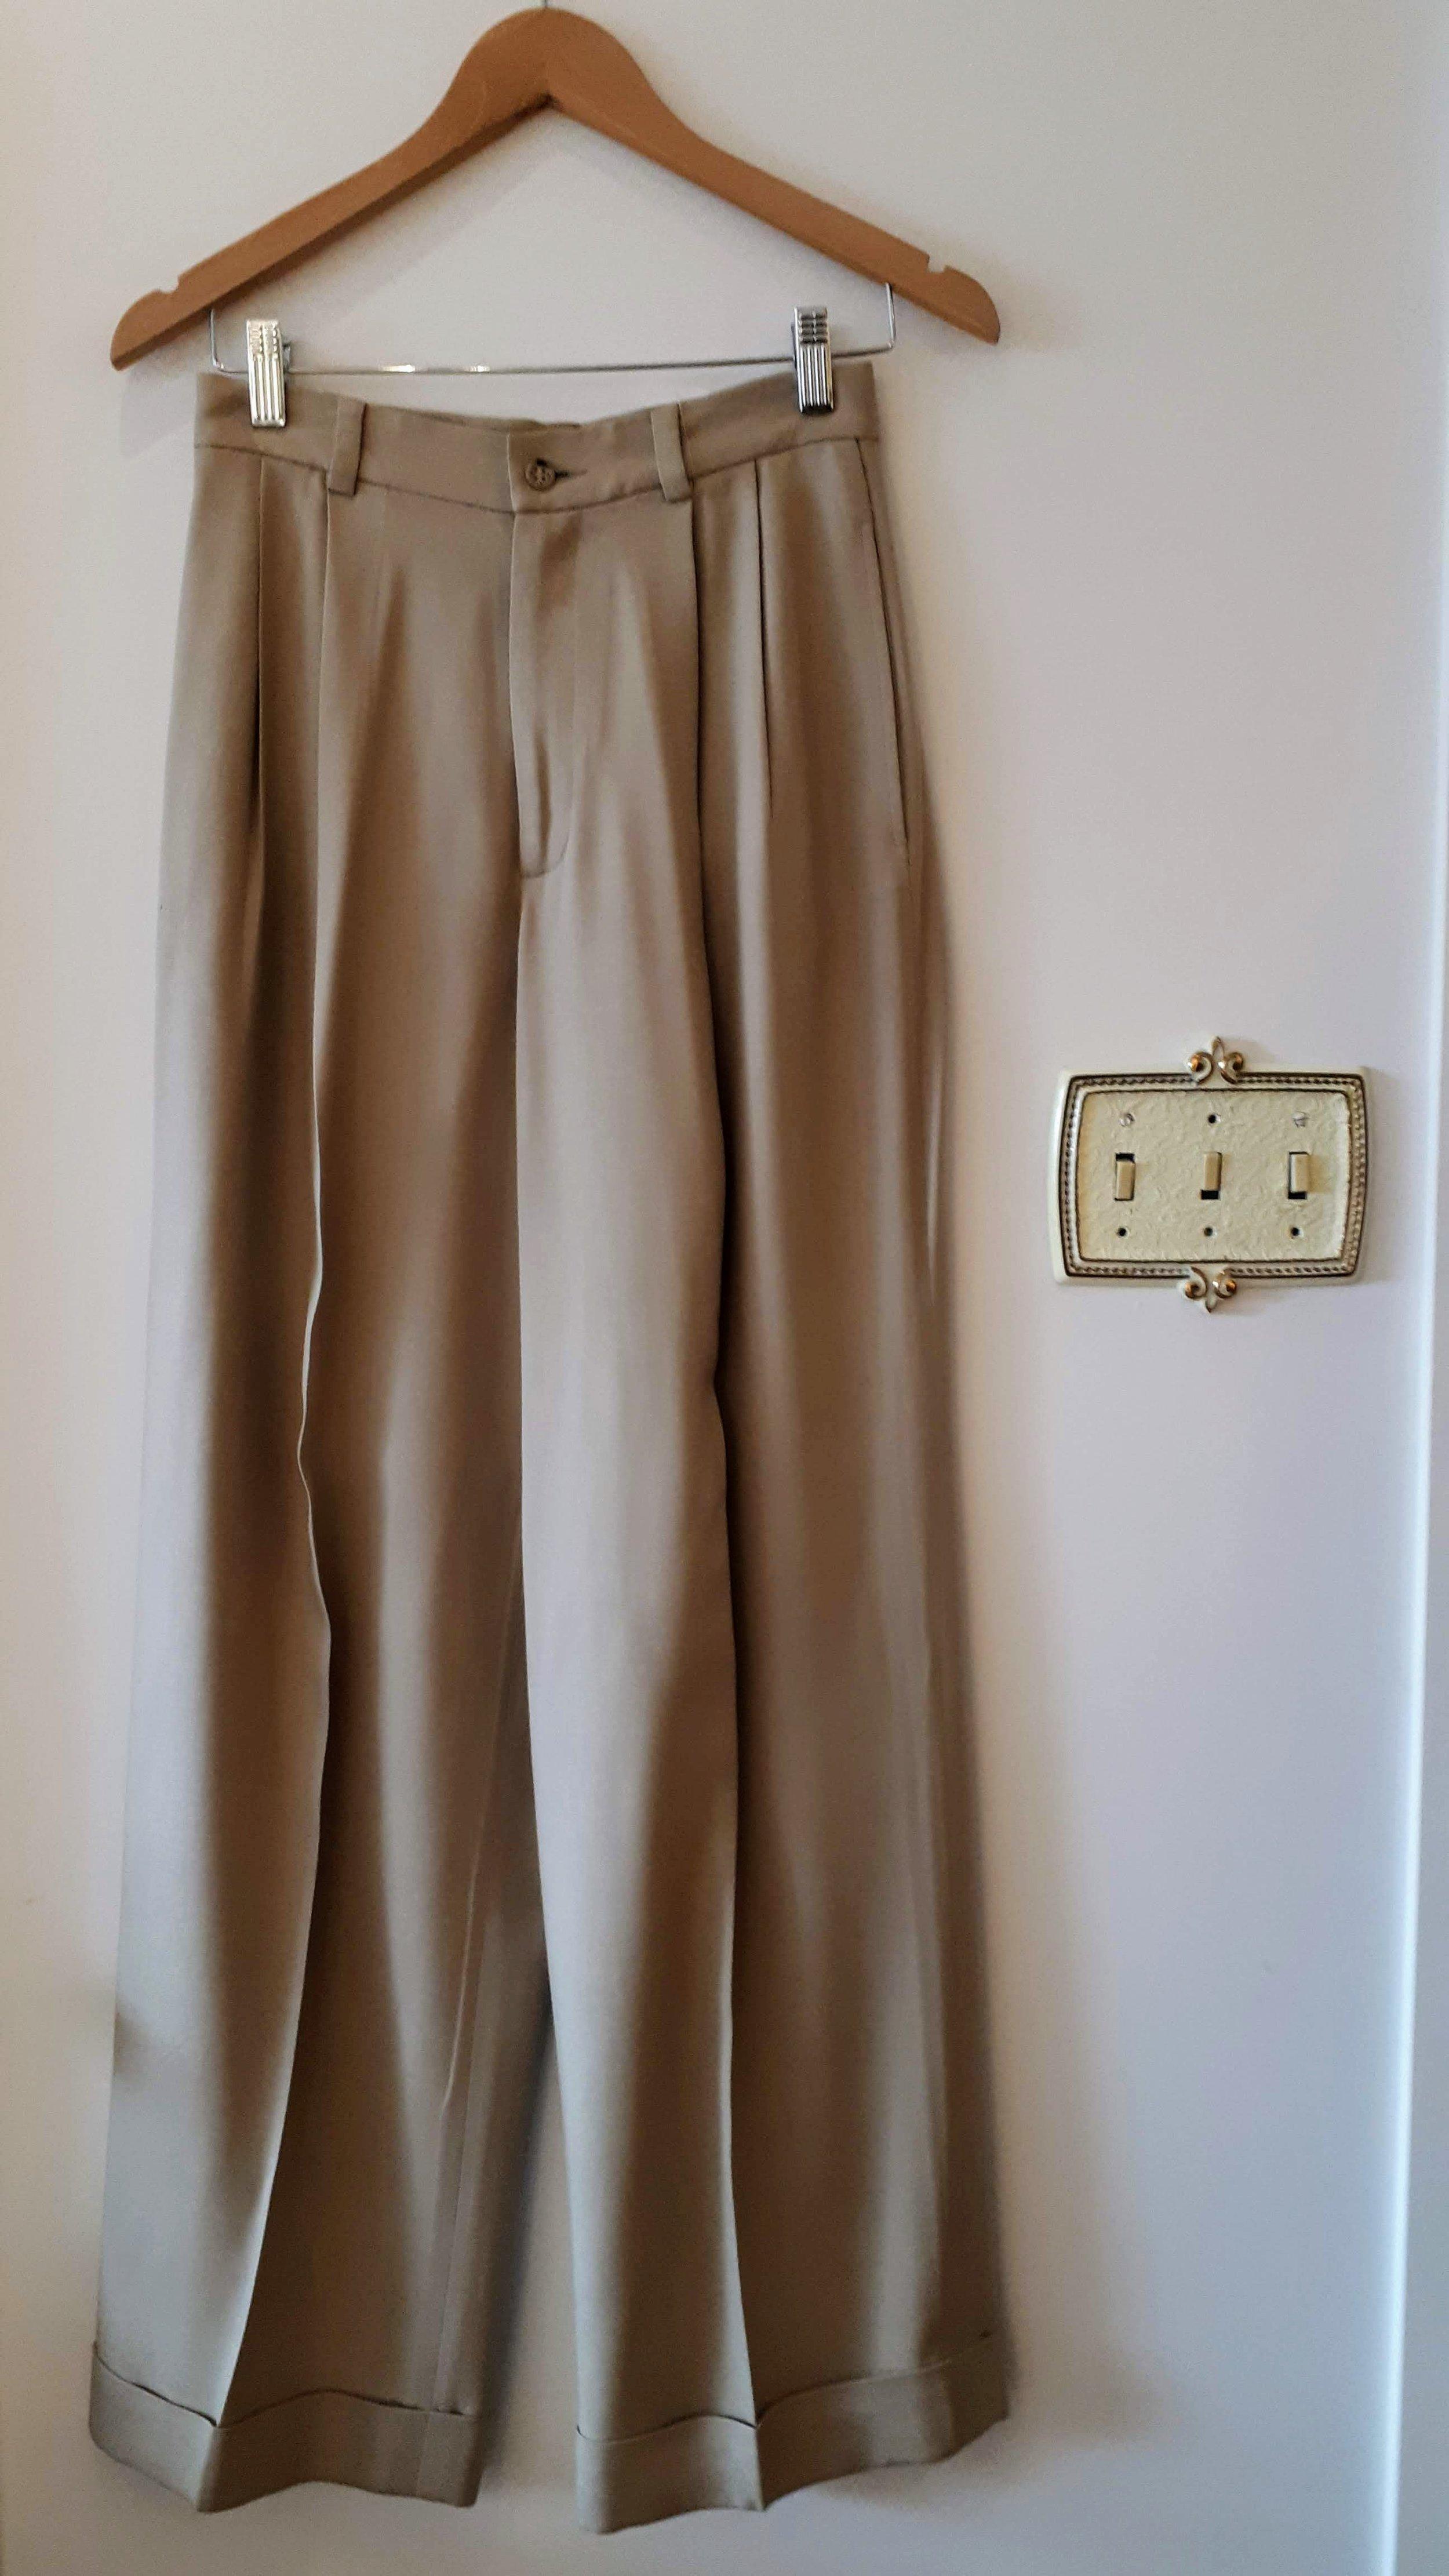 Banana Republic pants; Size 4, $38